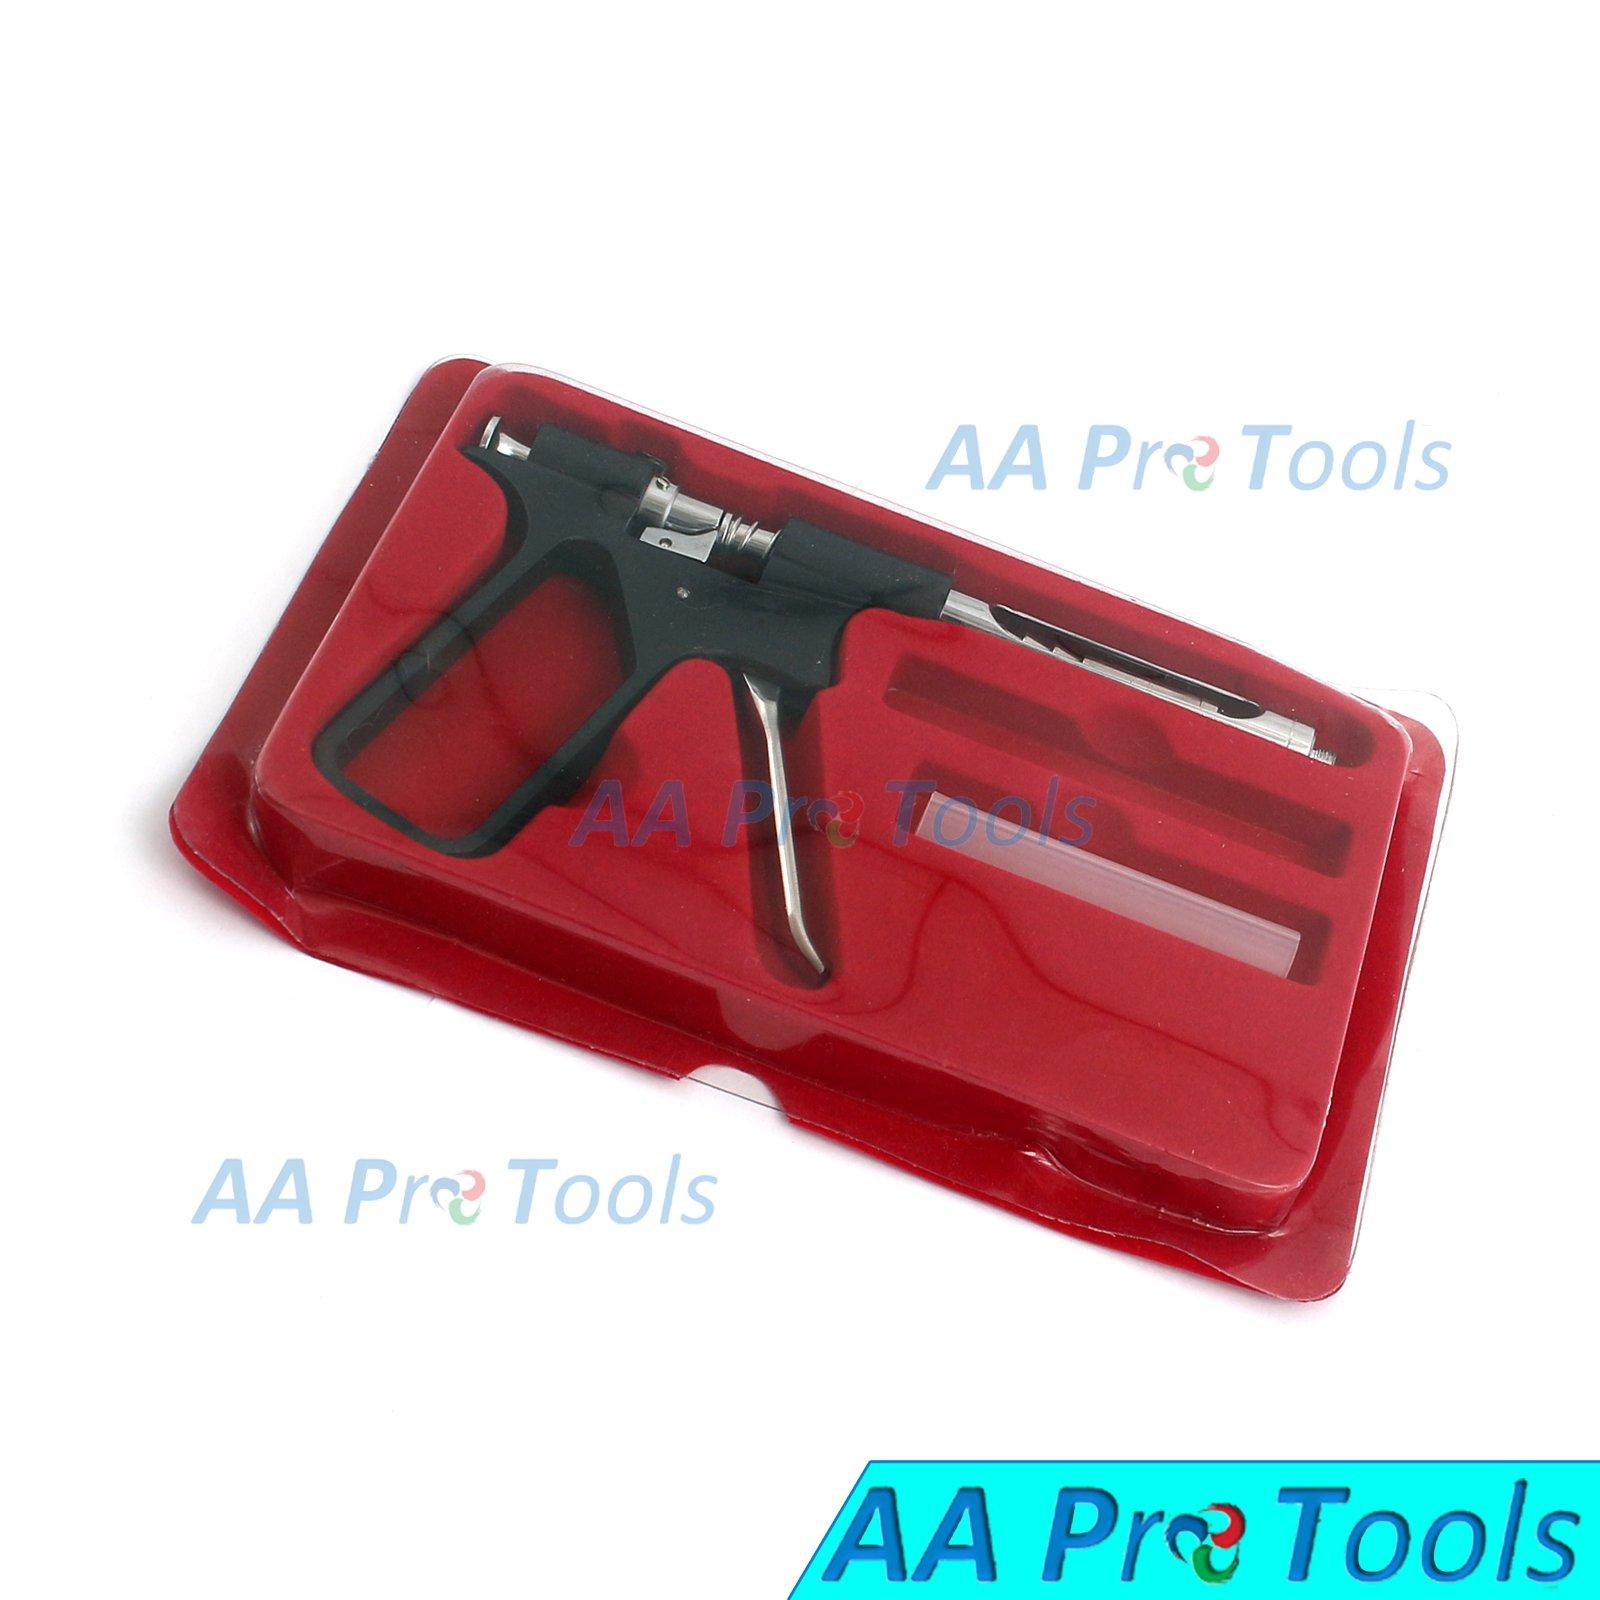 AA PRO 1PC LIGMAJECT INTRALIGAMENTAL ANESTHETIC Pistol Gun Syringe Dental Instrument A+ Quality